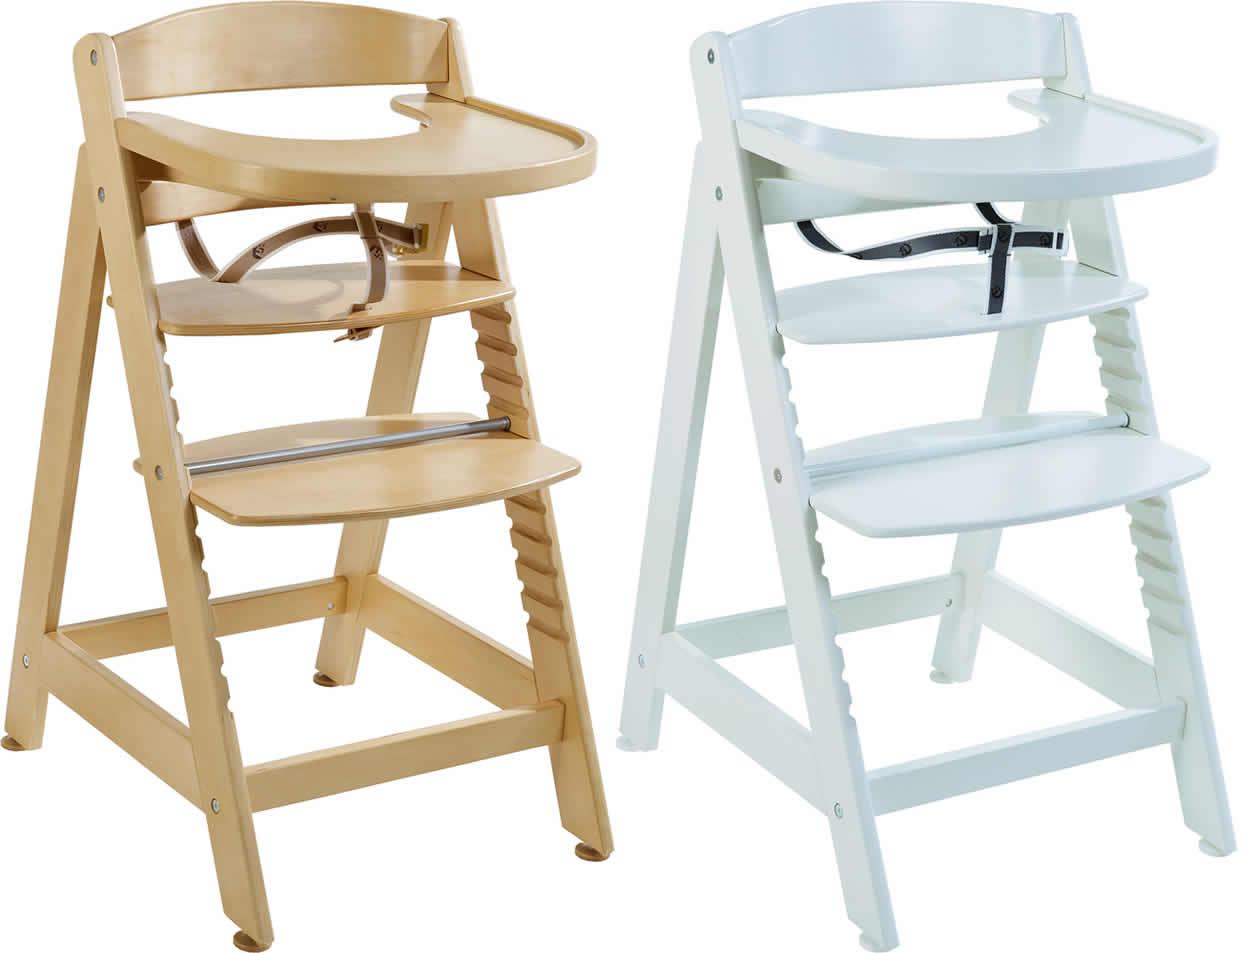 roba treppenhochstuhl sit up maxi hochstuhl kinderhochstuhl ro7562 ebay. Black Bedroom Furniture Sets. Home Design Ideas